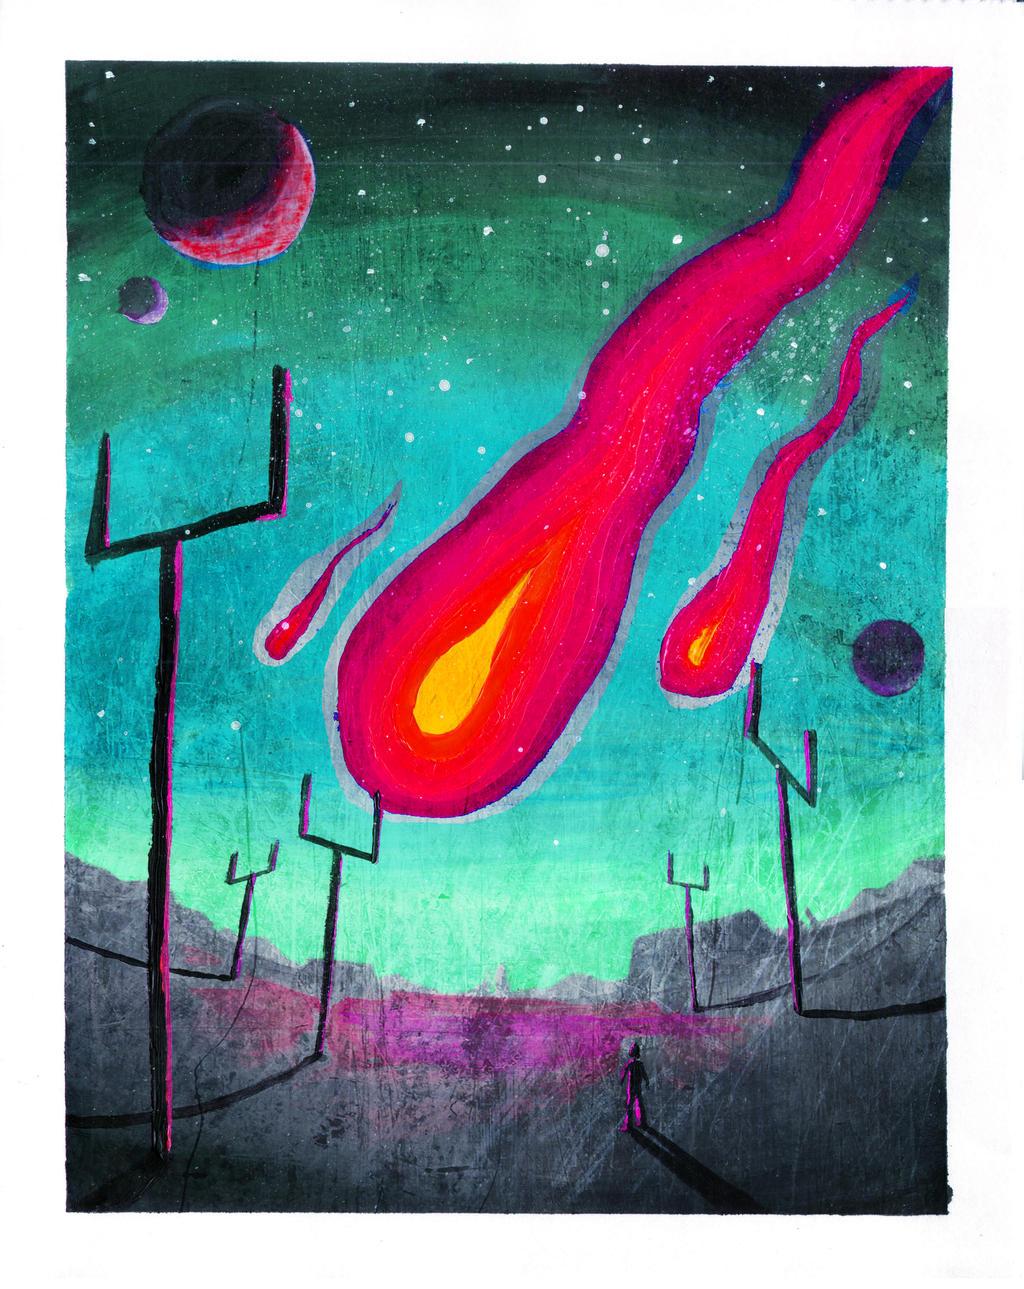 apocalypse please by JACKIEthePIRATE